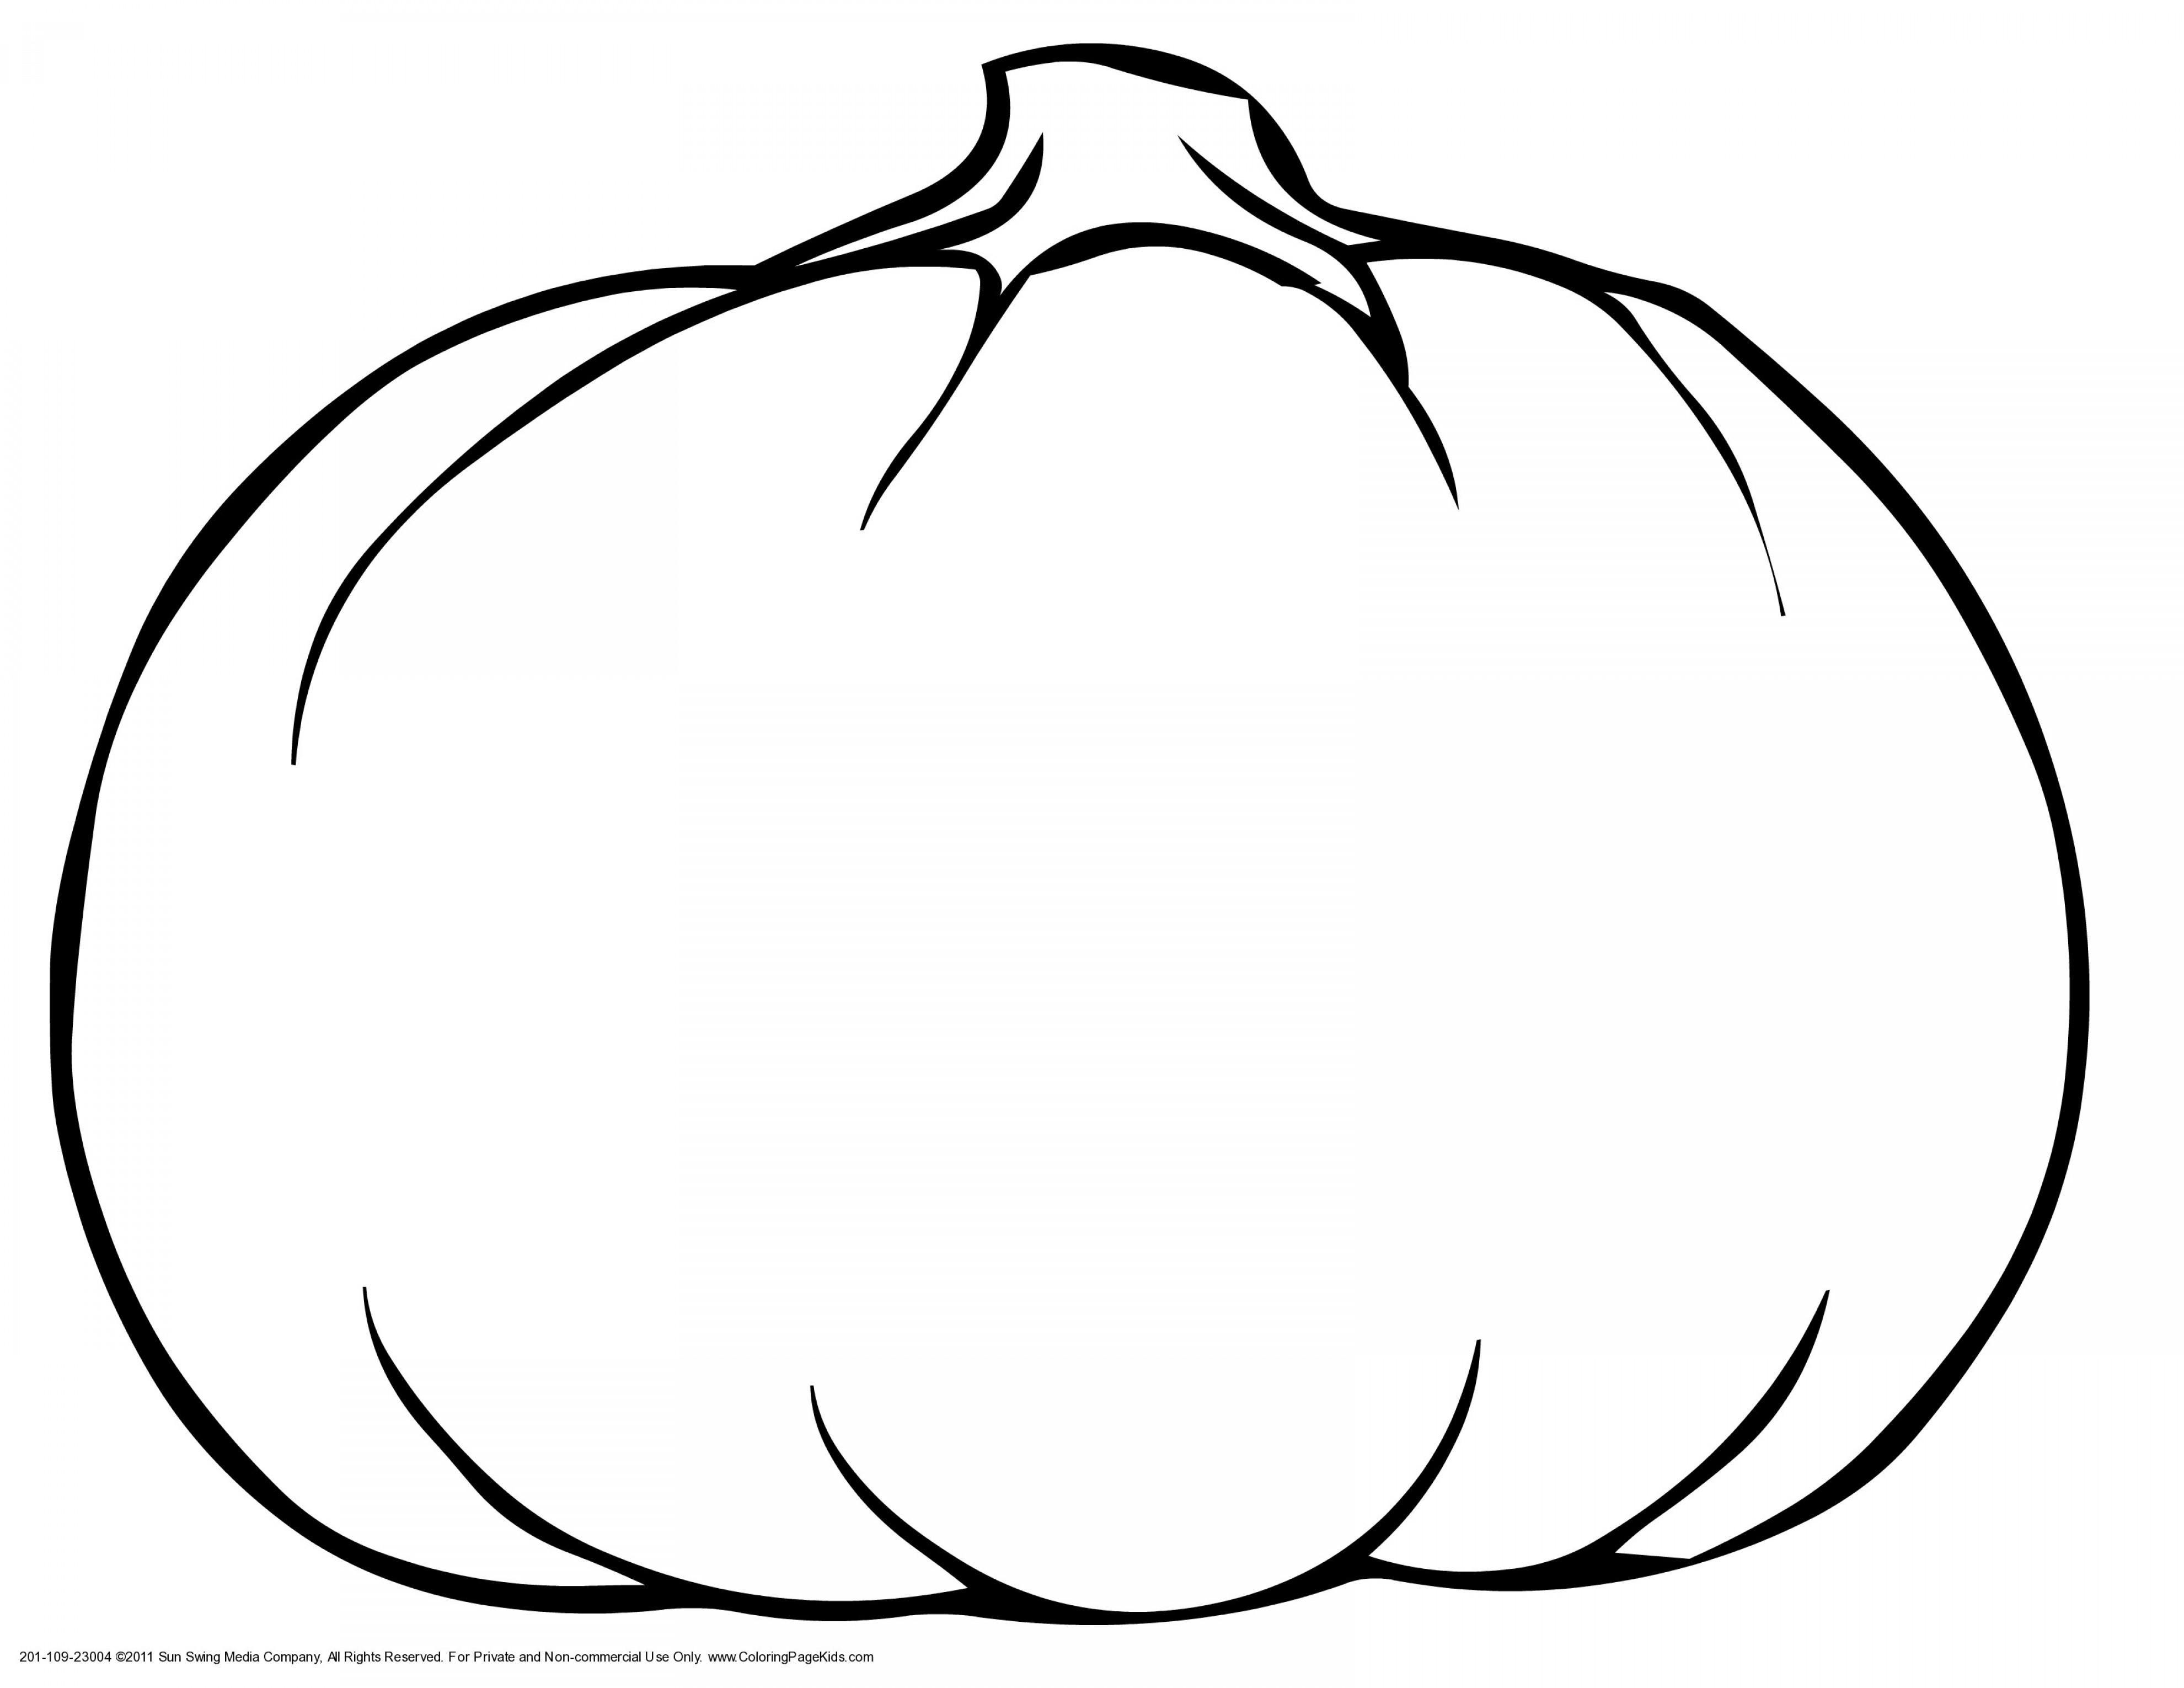 Pumpkin Clipart Outline Images Pumpkin Coloring Sheet Pumpkin Coloring Pages Pumpkin Outline